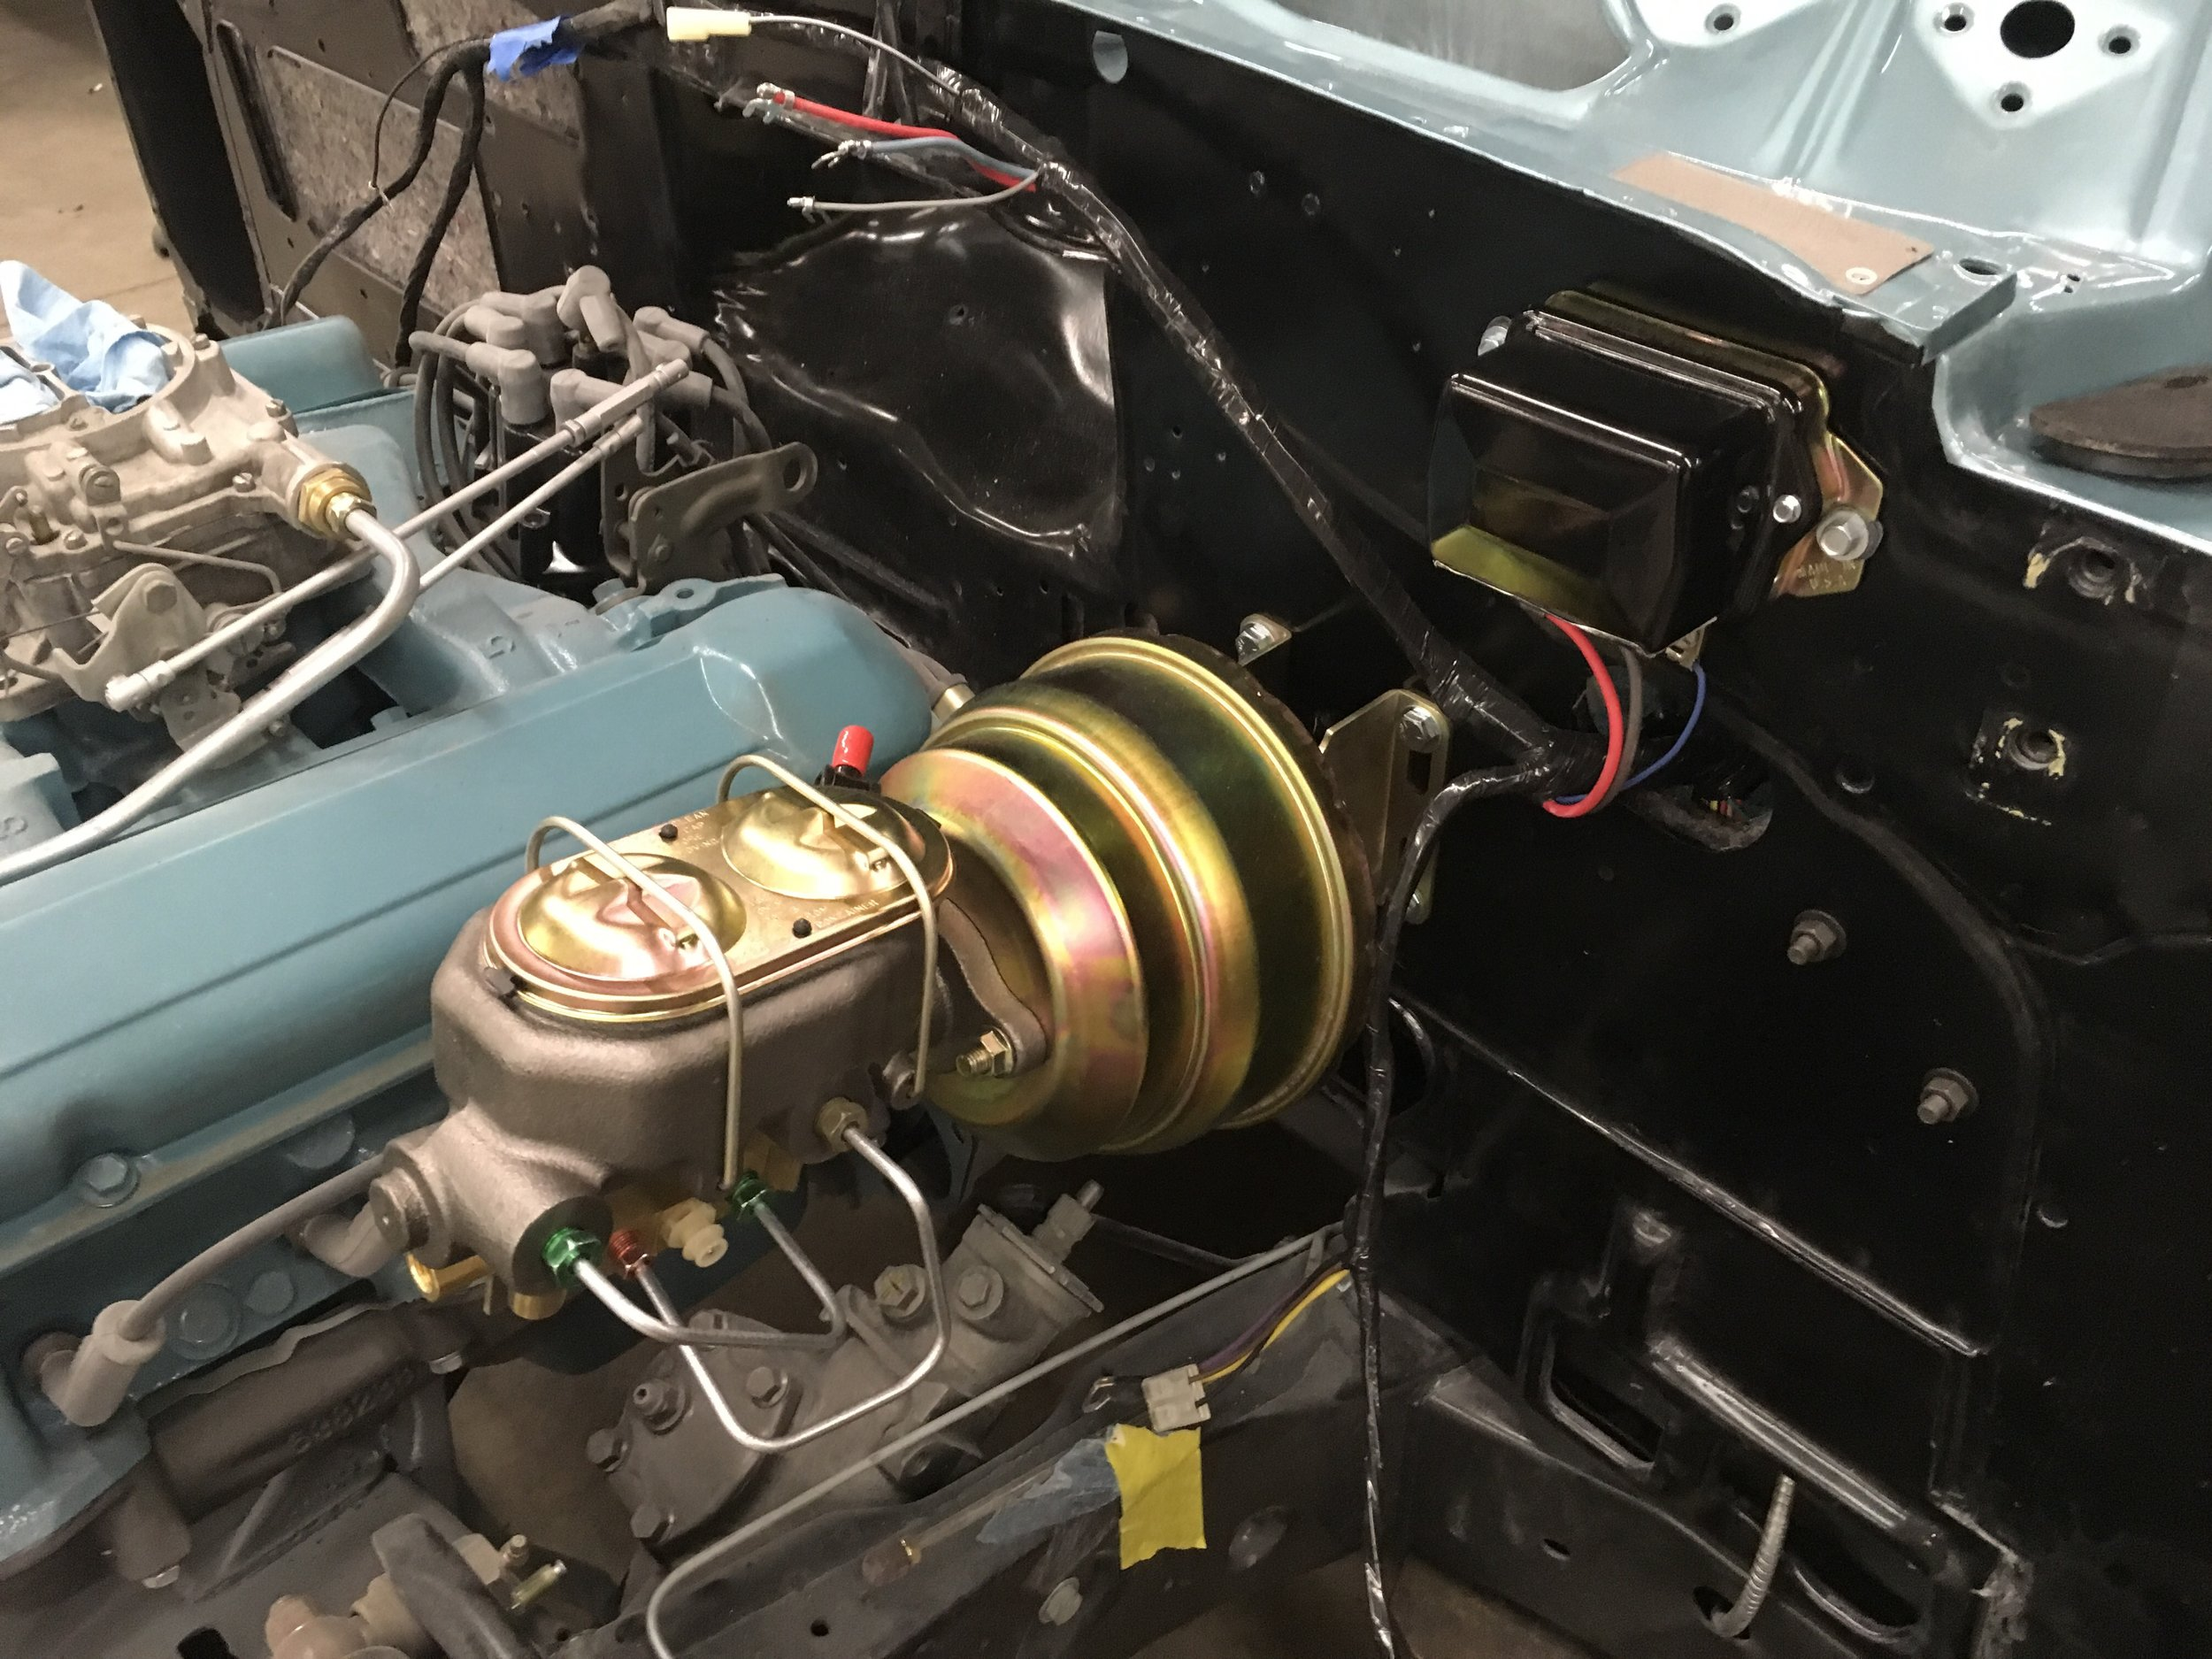 1962-pontiac-bonneville-minneapolis-hot-rod-custom-build-restoration-36.jpg